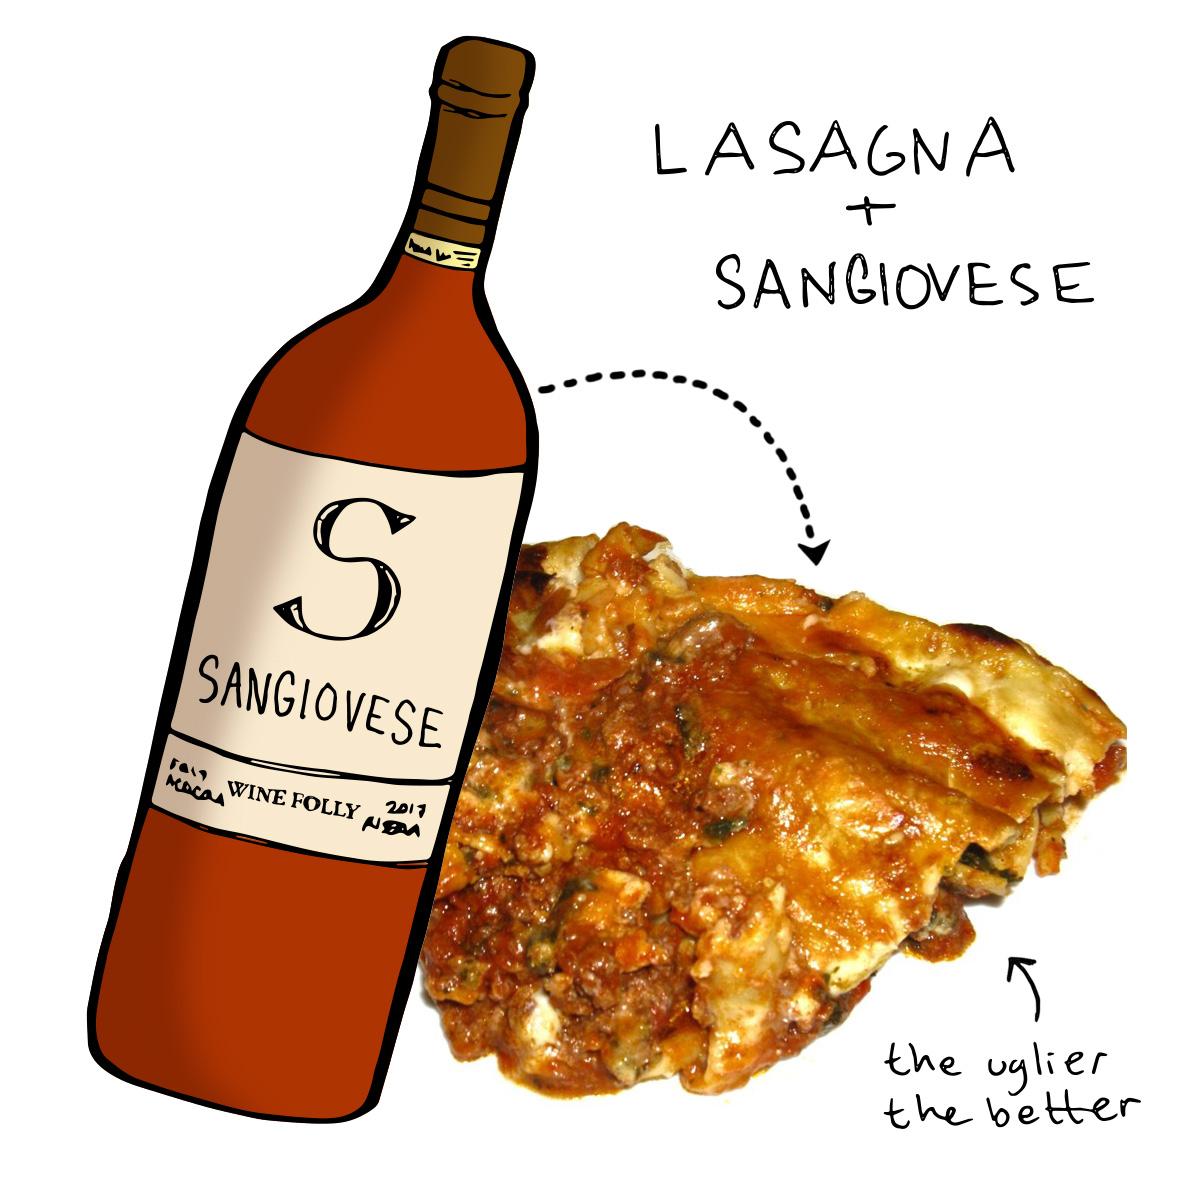 lasagna-wine-pairing-sangiovese-winefolly